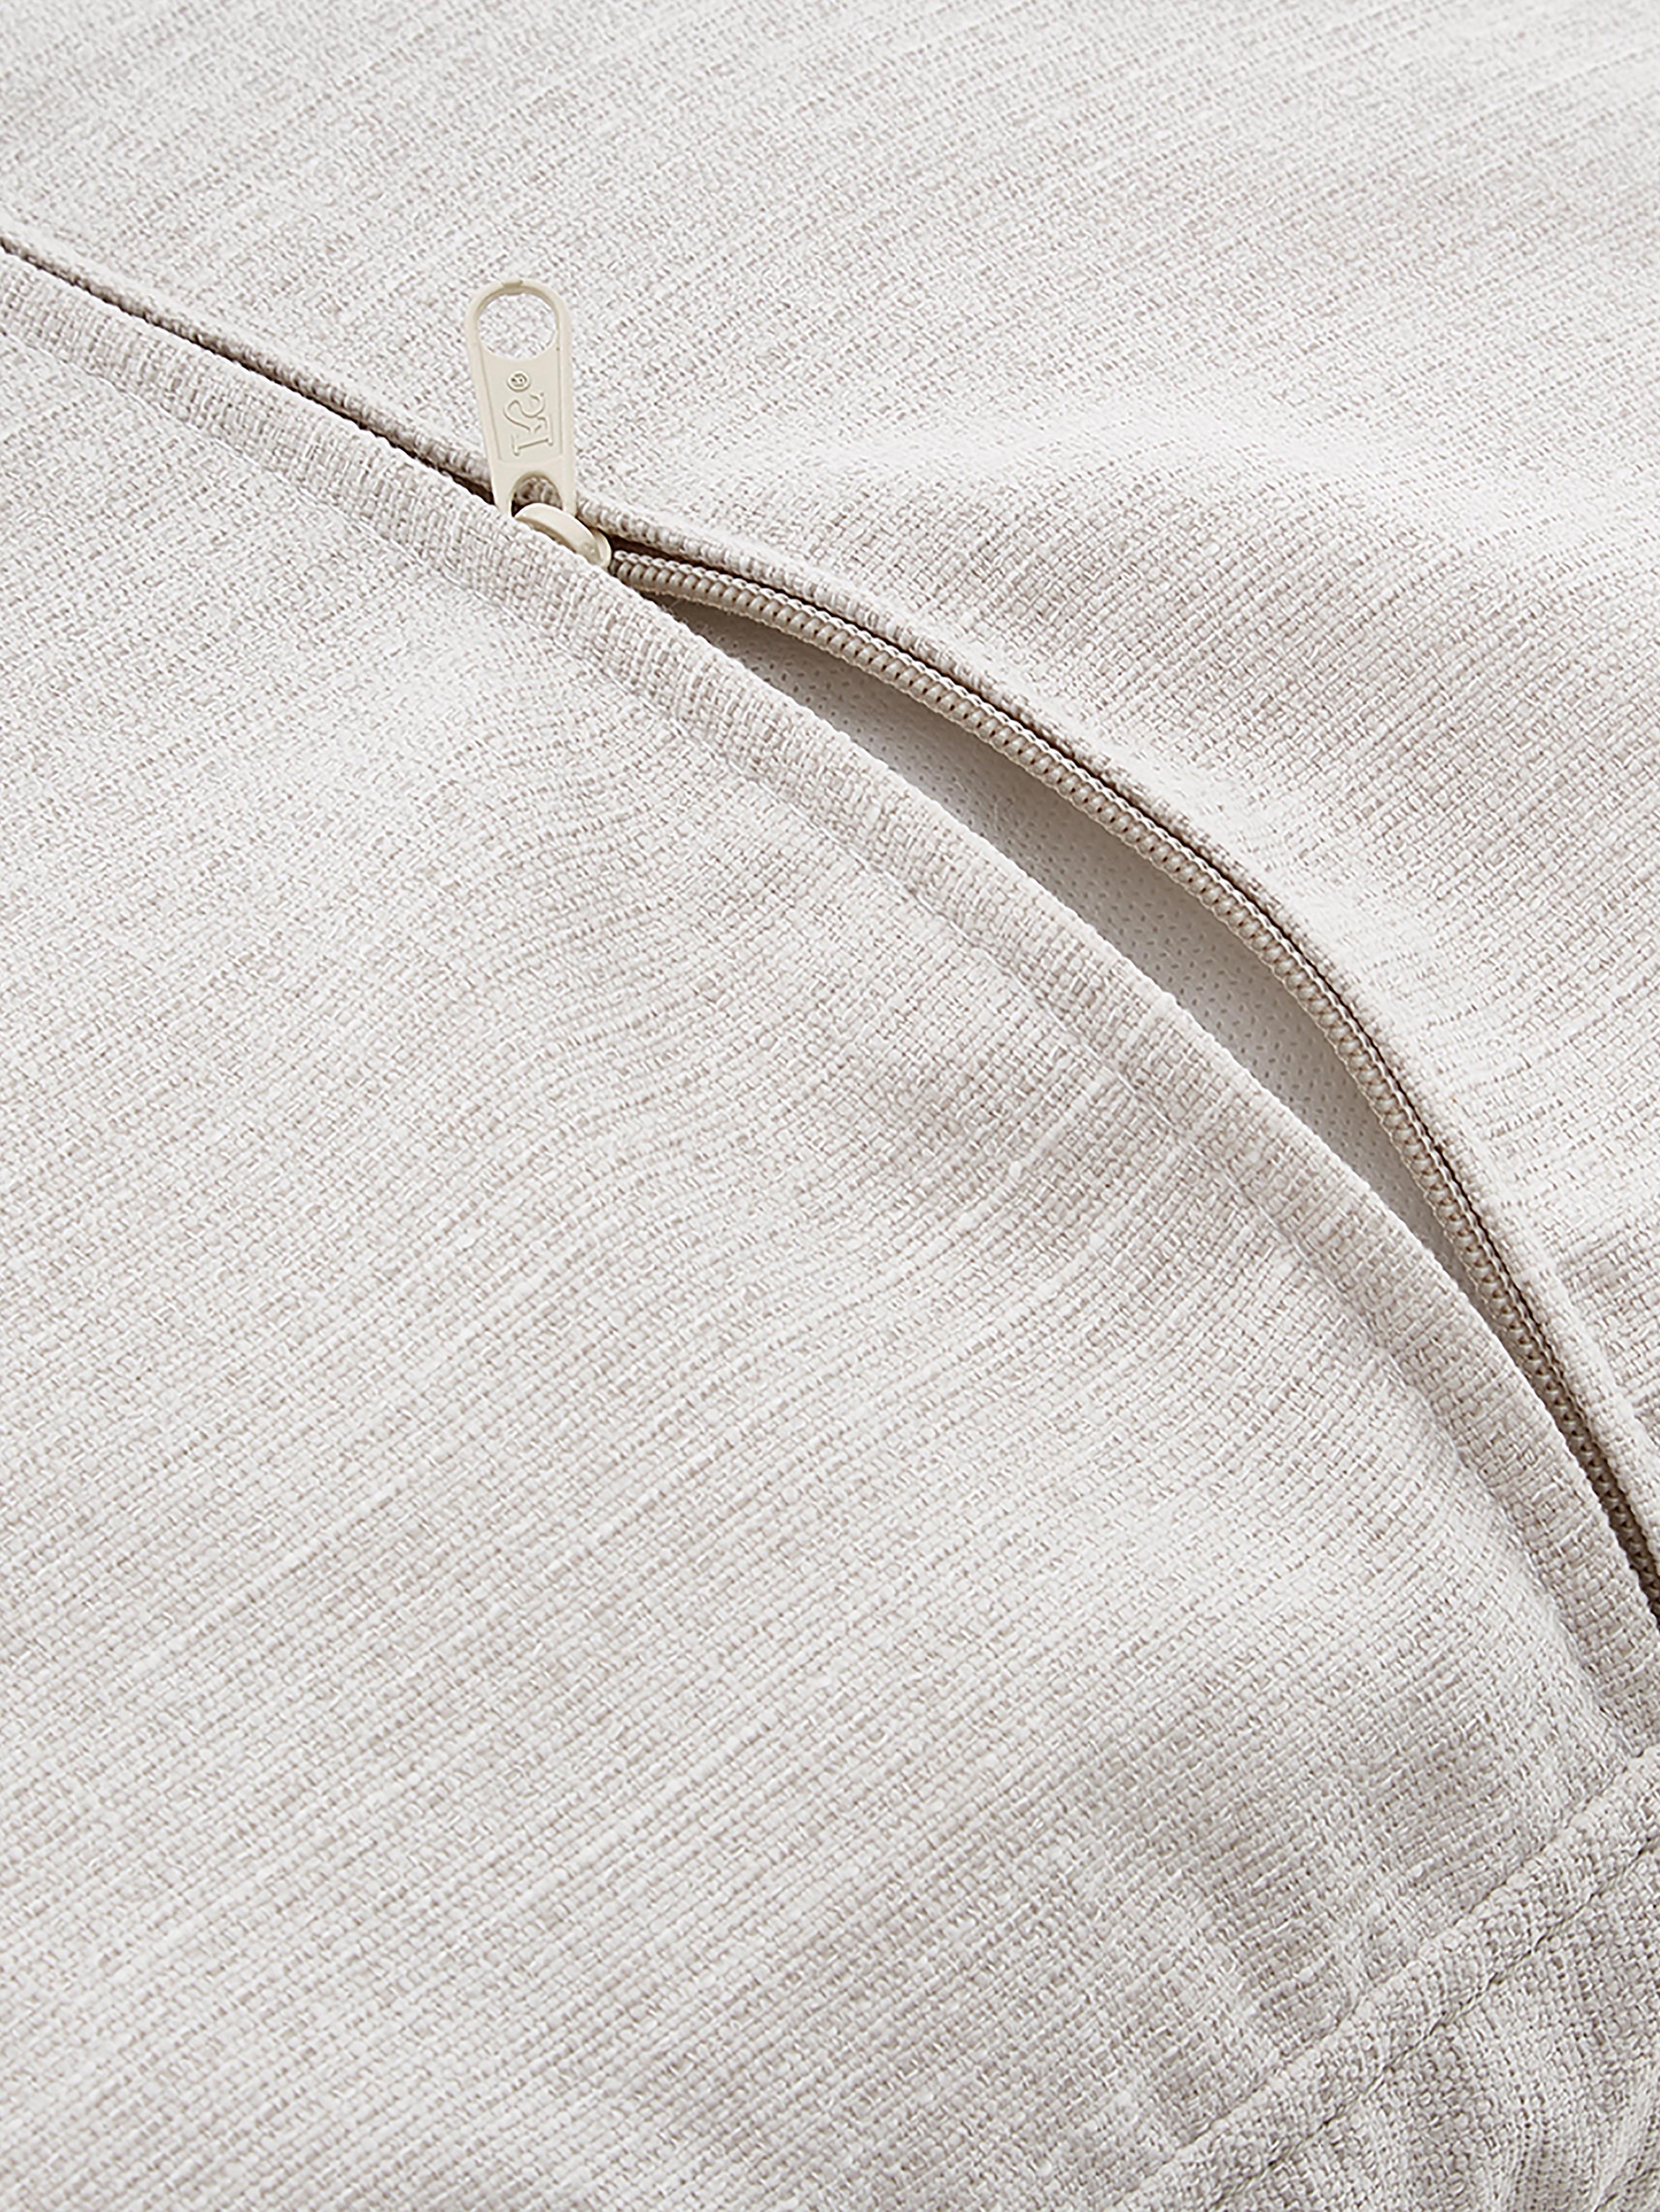 Hoekbank Carrie, Bekleding: polyester, Frame: spaanplaat, hardboard, mu, Poten: gelakt metaal, Geweven stof beige, B 241 x D 200 cm